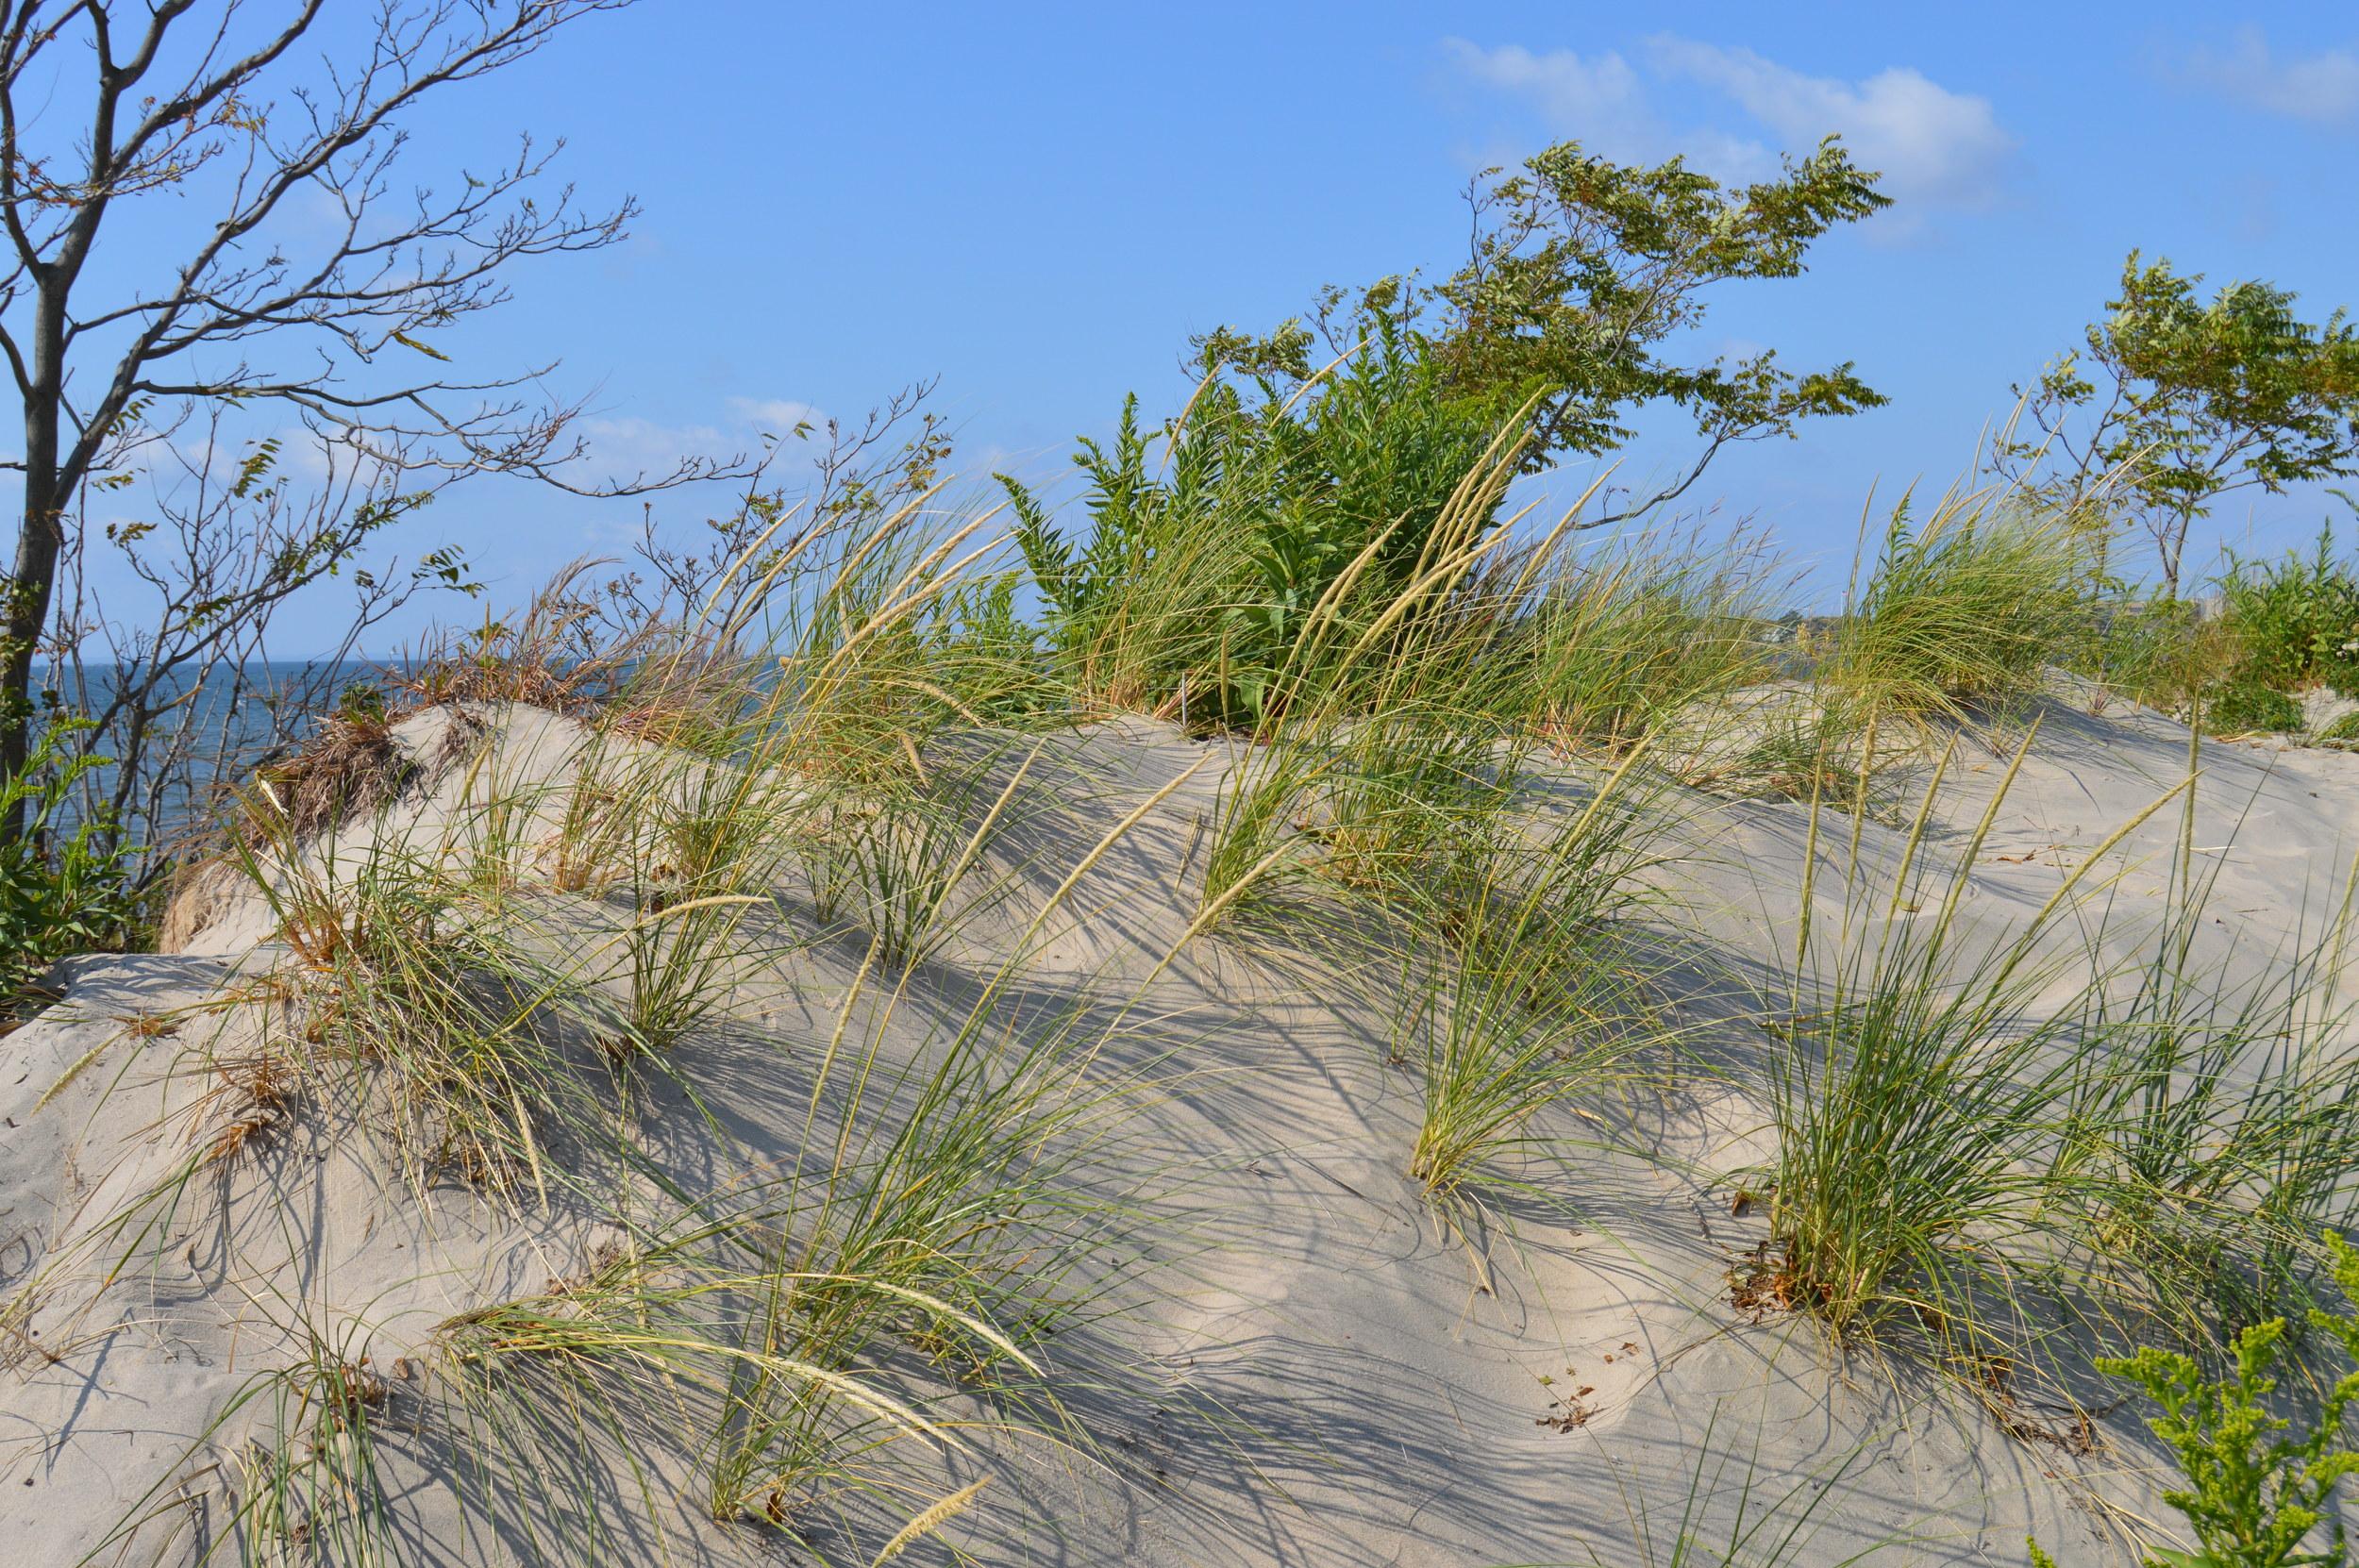 Plumb Beach Dune 9-20-2014.JPG